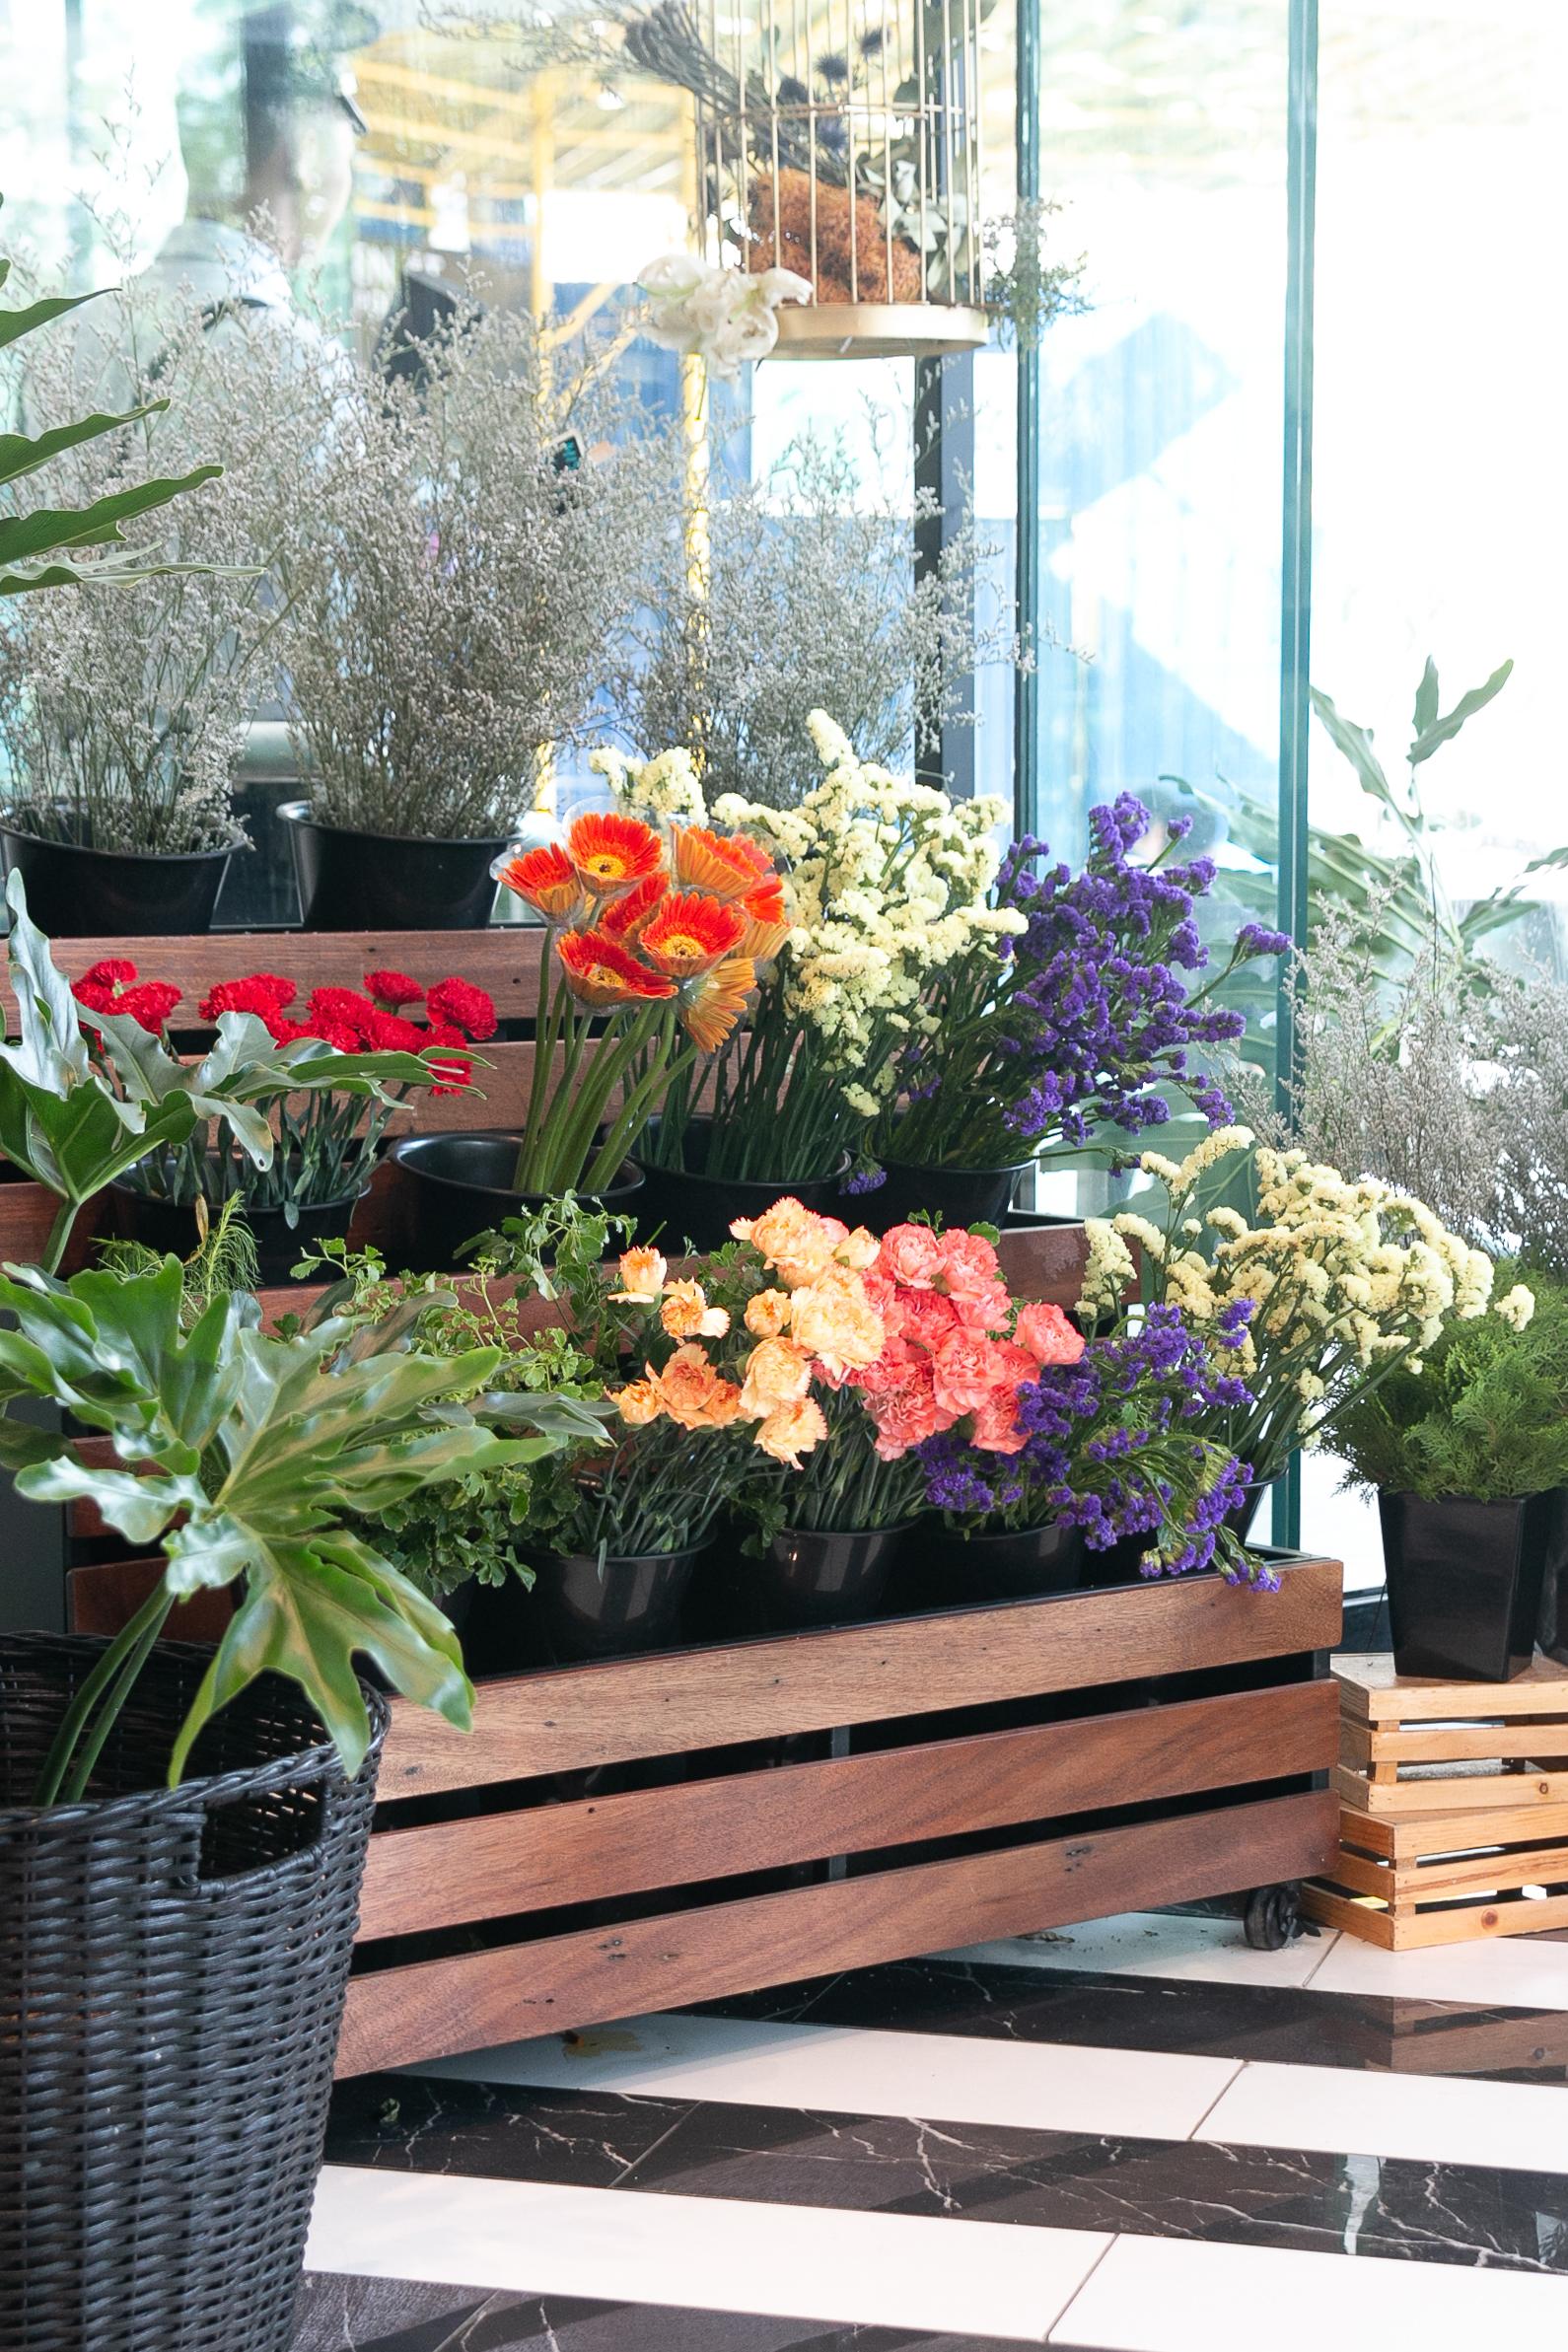 nolisoli.ph eats restaurant Ça Va Creperie & Floral Atelier the podium crepes